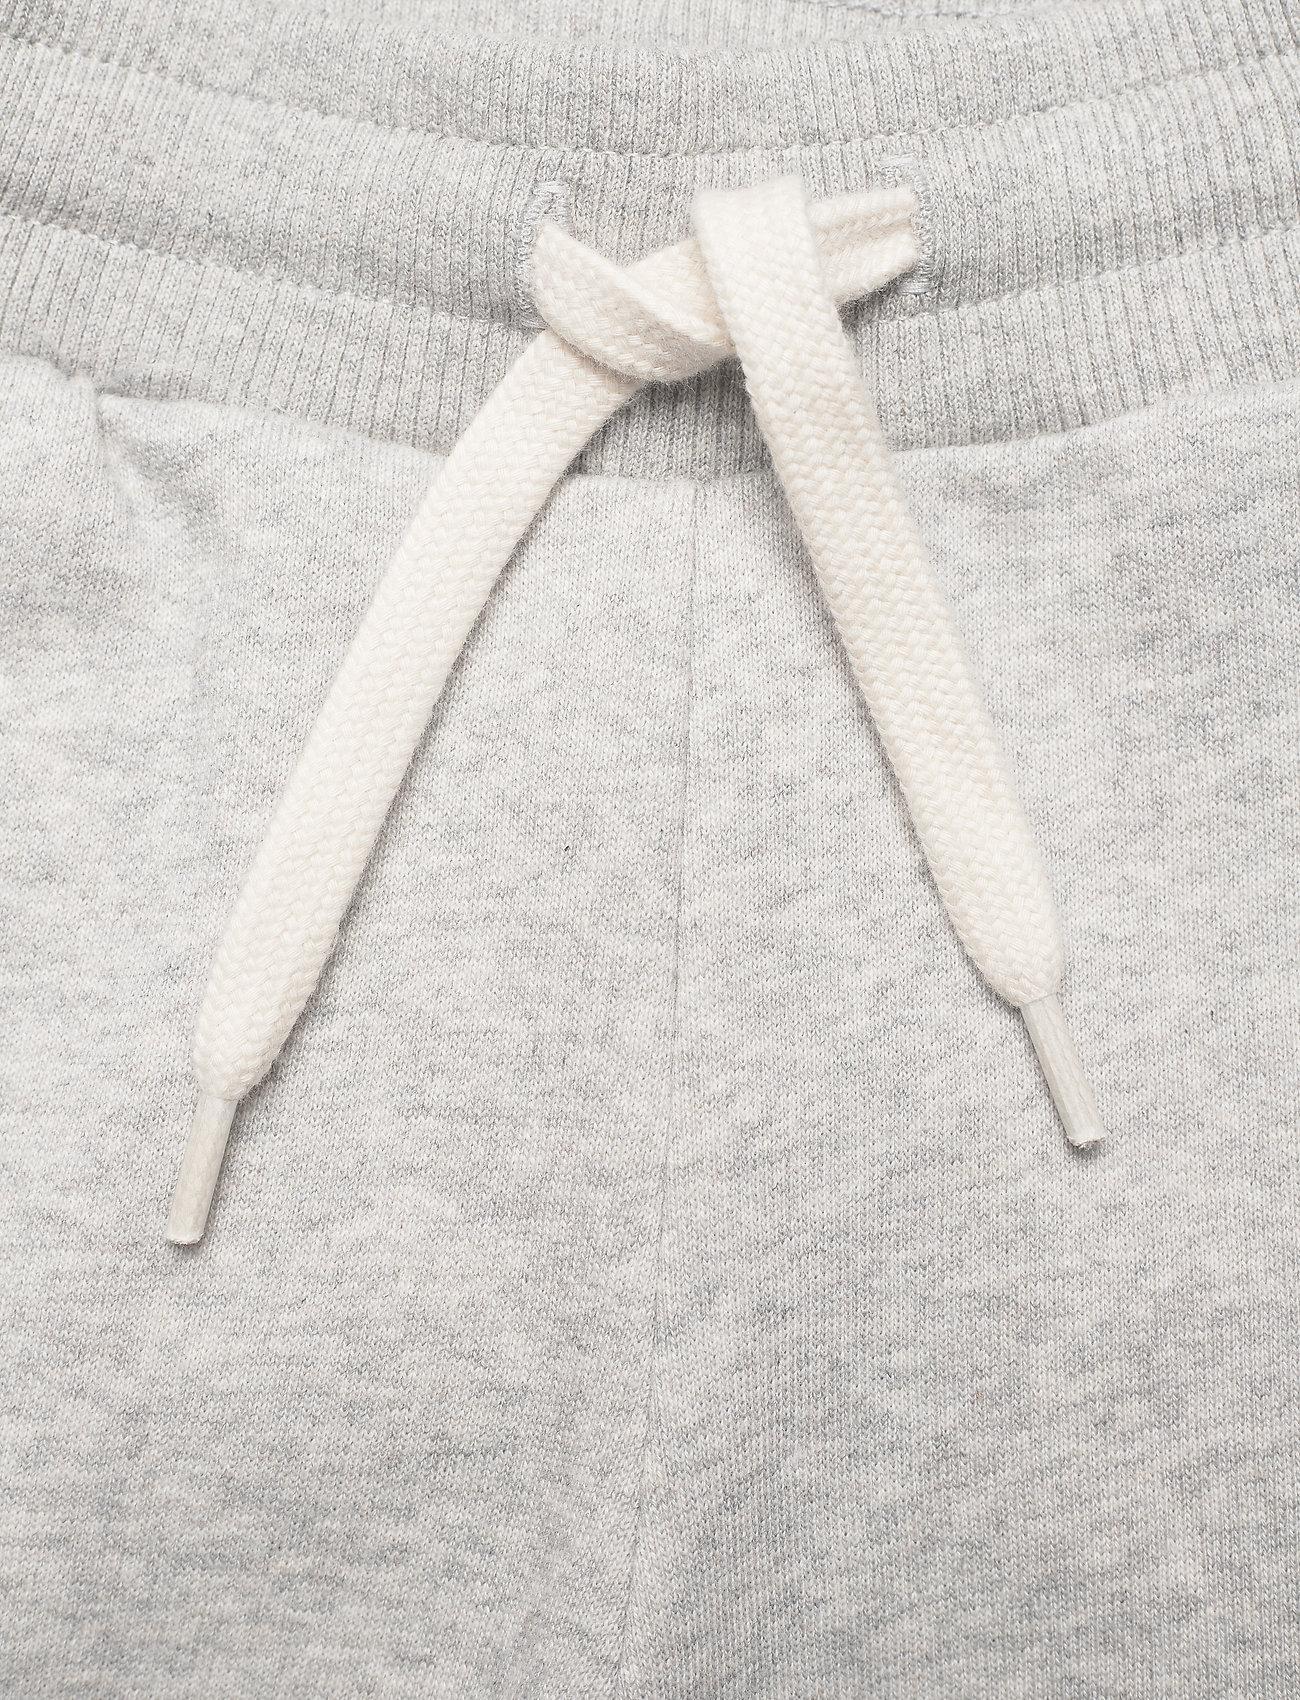 Mini A Ture - Even pants, K - sweatpants - light grey melange - 3